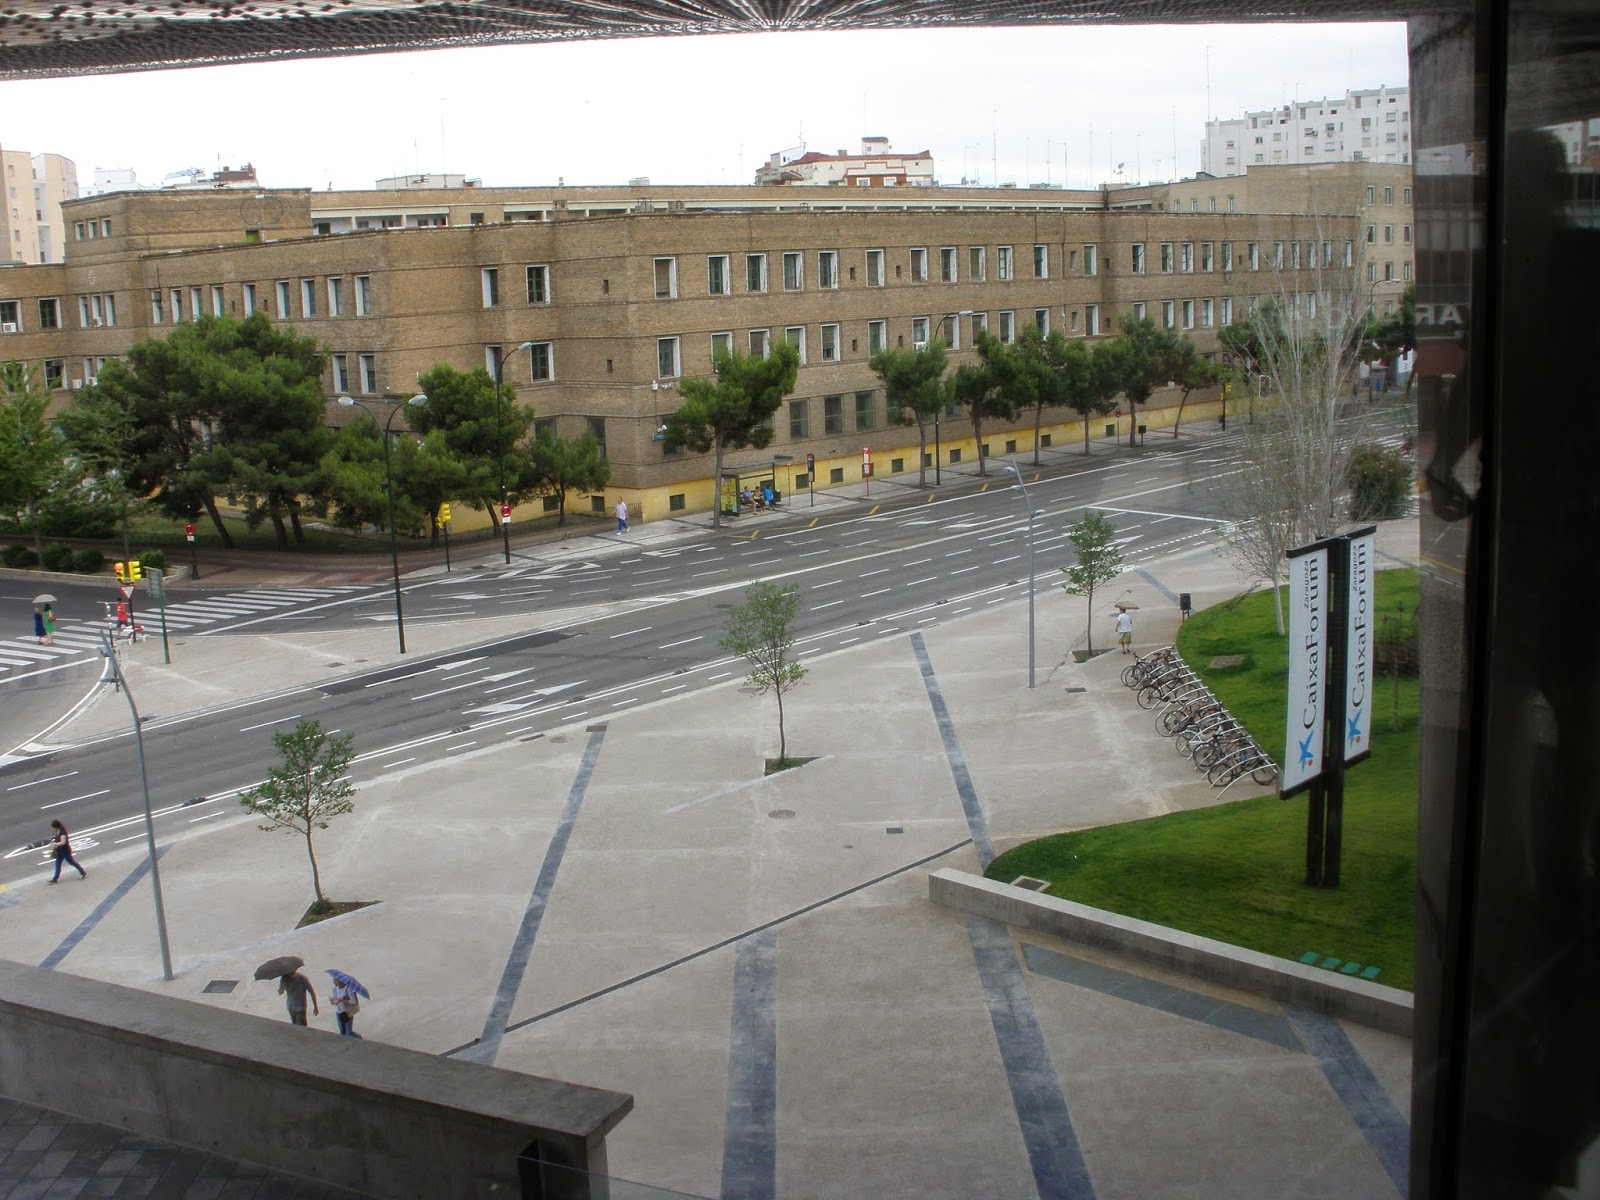 Plaza CaixaForum Zaragoza